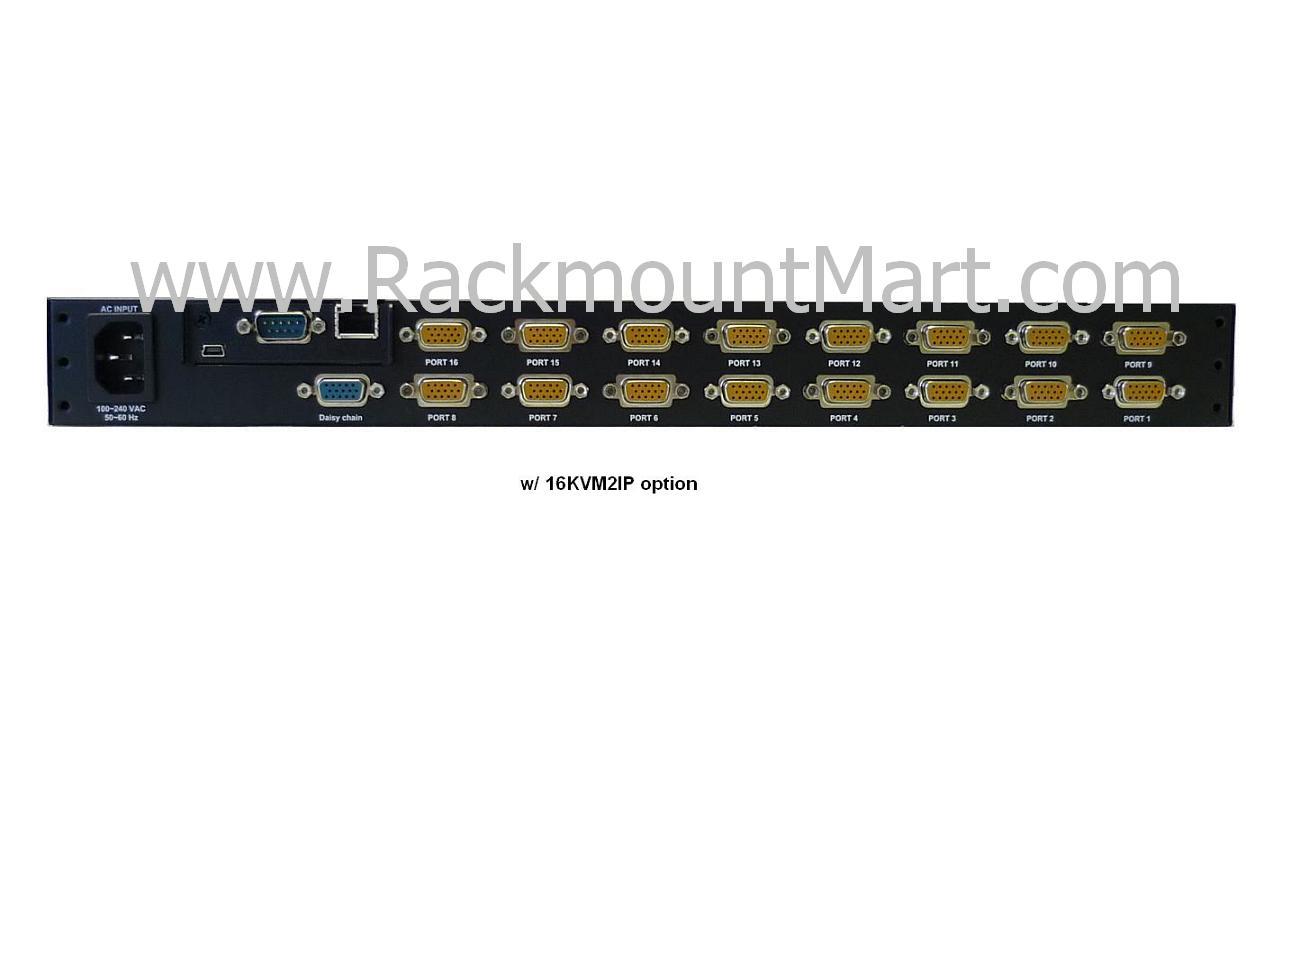 lcd1u17 22 1u rack moun 17 tft lcd keyboard drawer. Black Bedroom Furniture Sets. Home Design Ideas